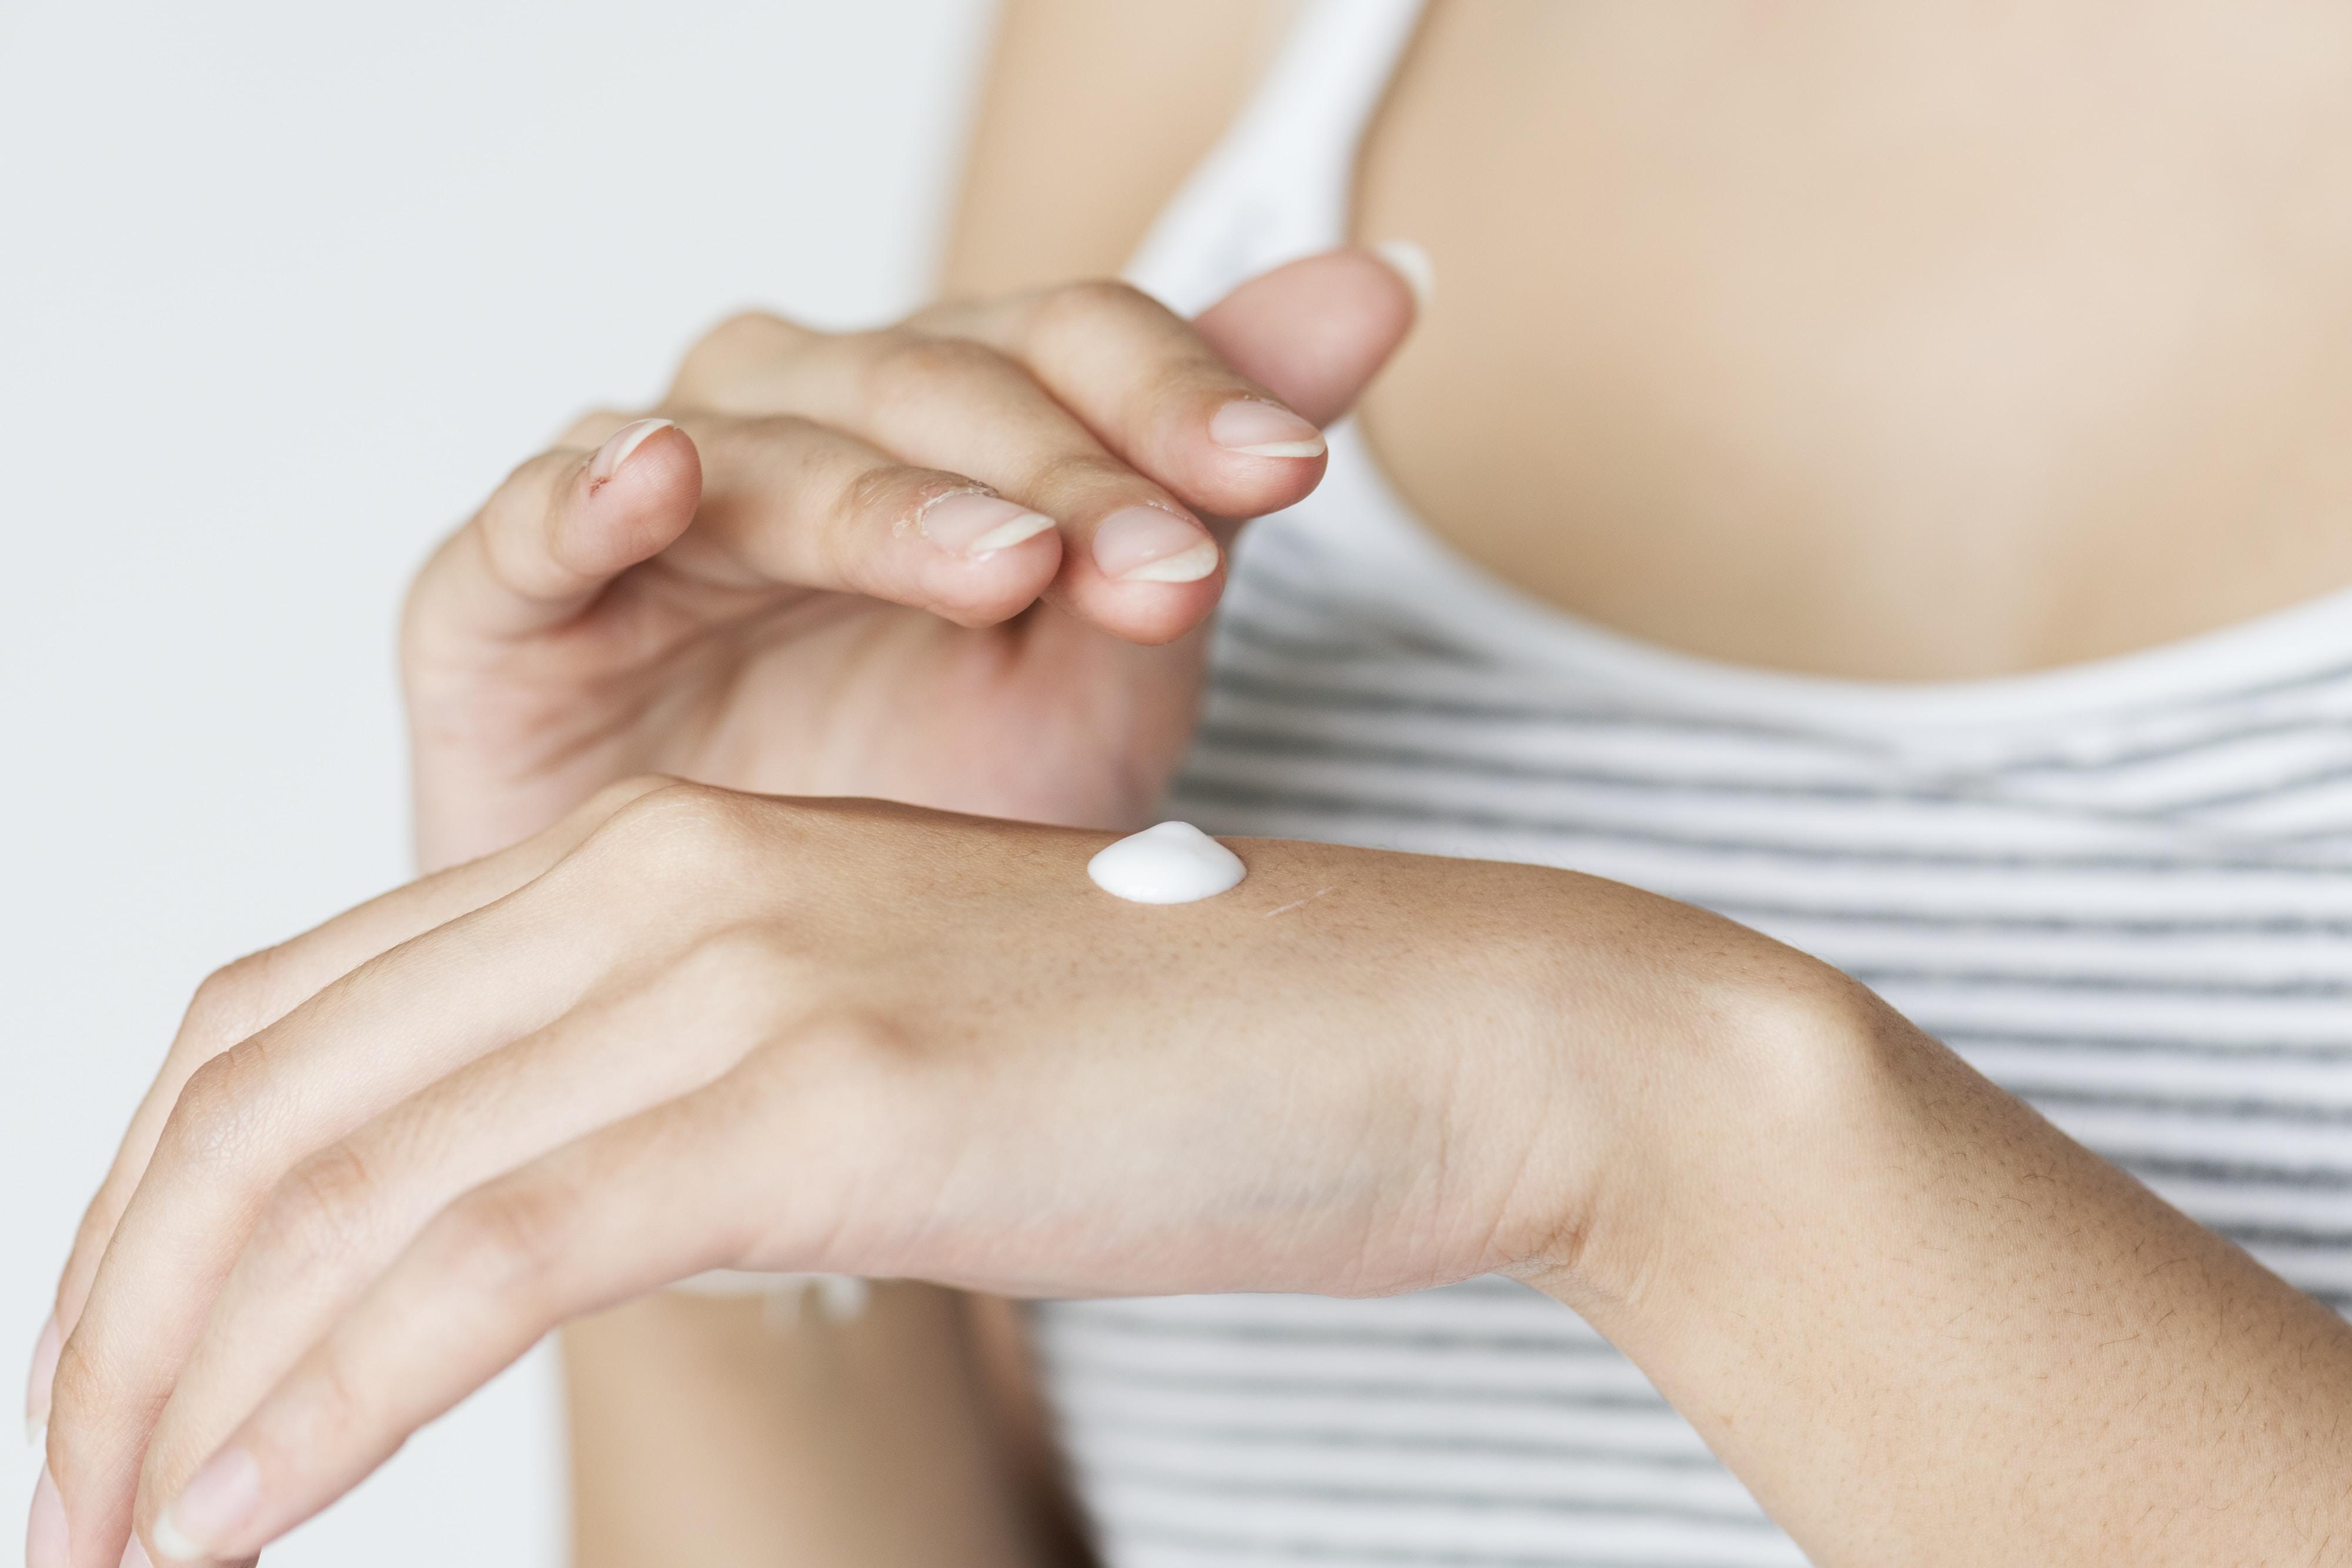 white cream on woman's hand